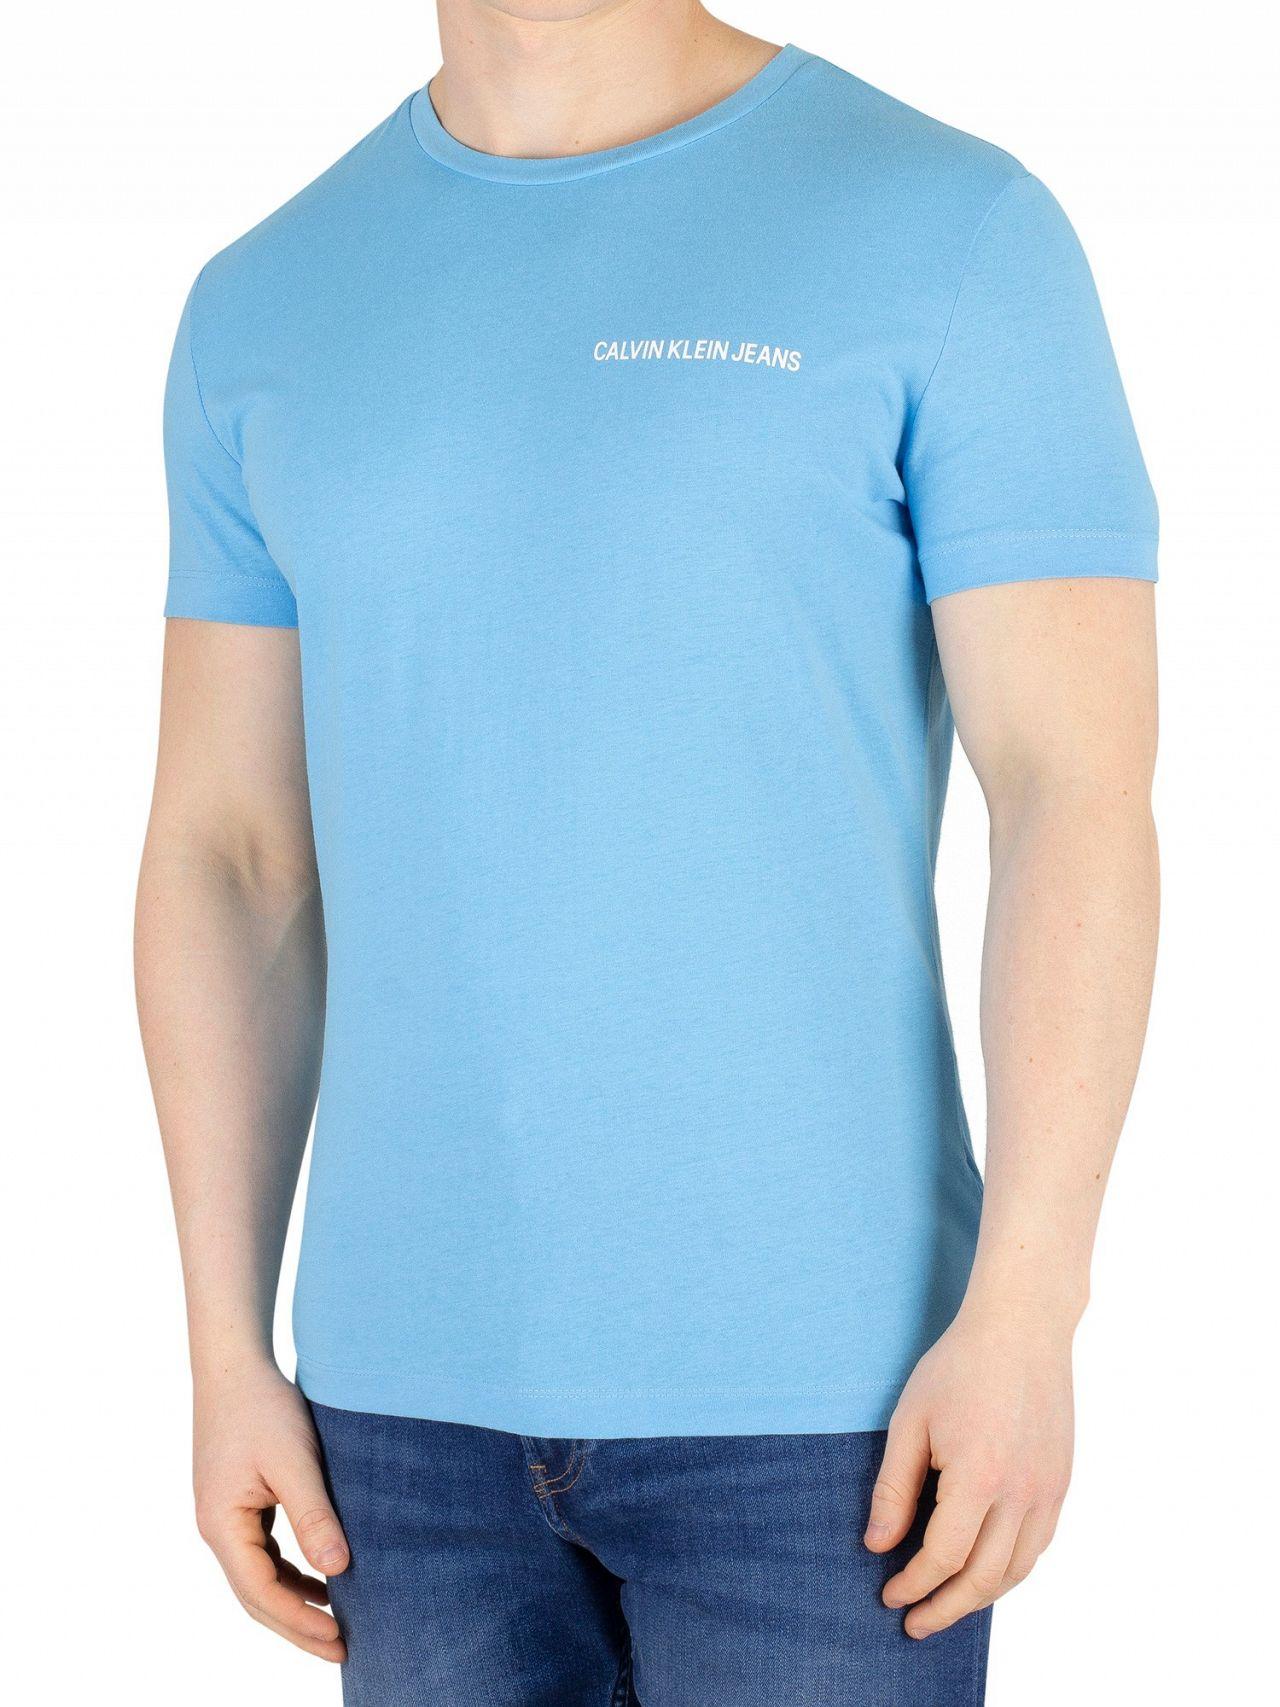 2985f4a0bf79 Calvin Klein Jeans Alaskan Blue Chest Institutional T-Shirt | Standout